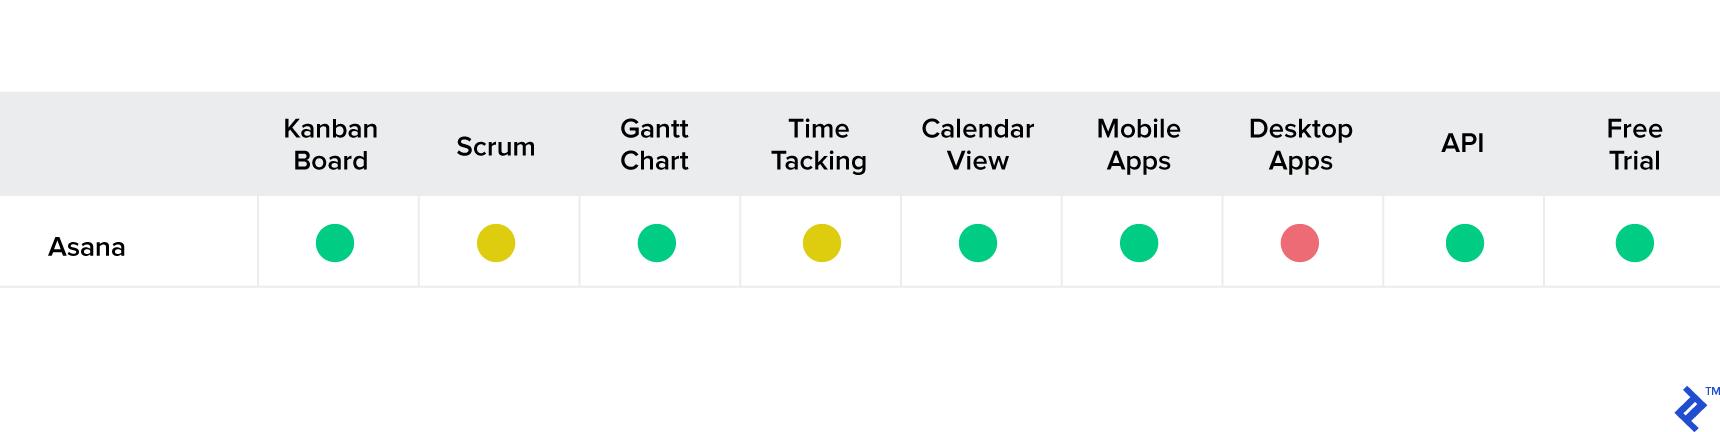 Asana feature set for project management.